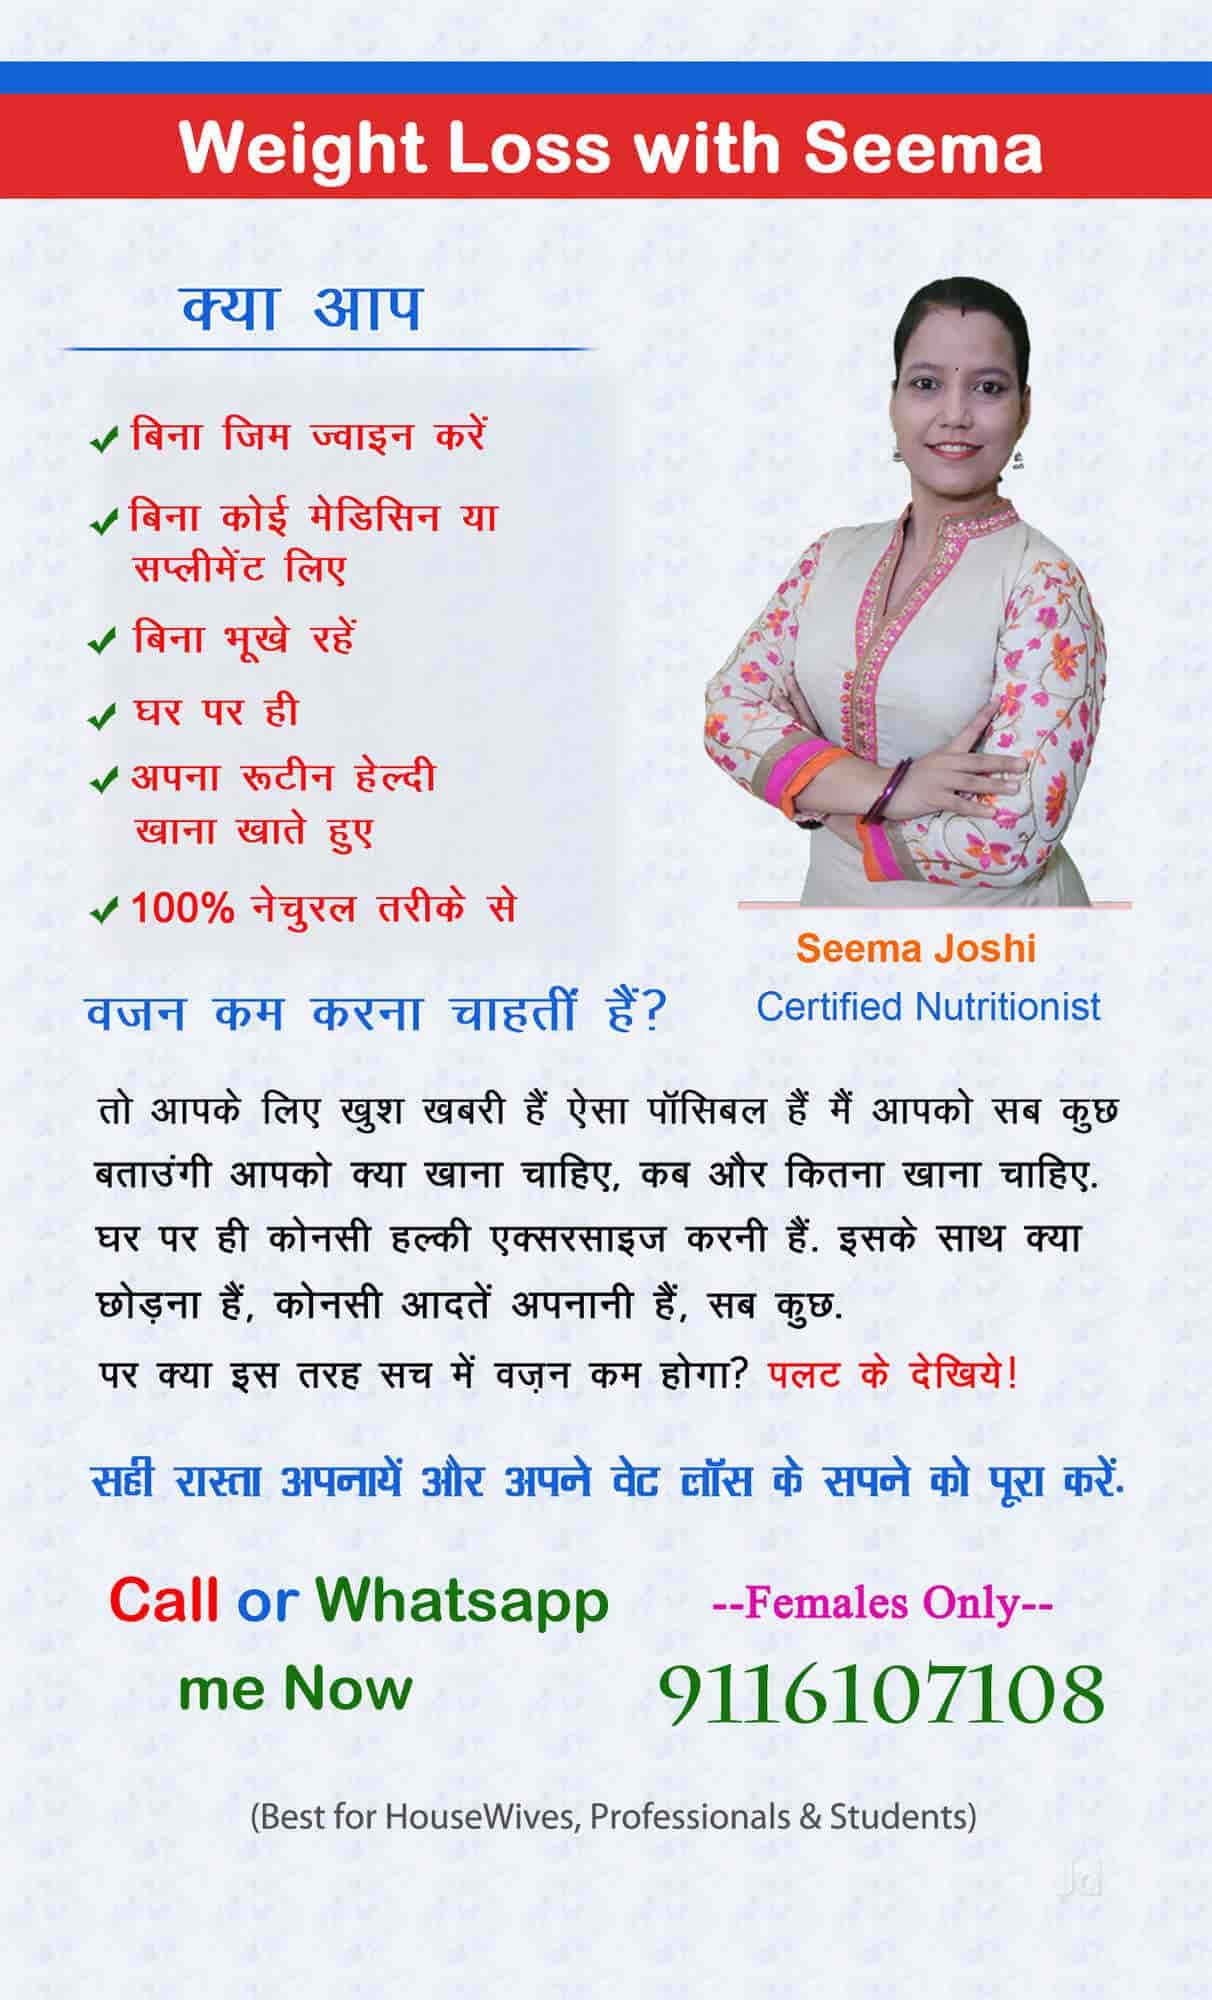 Weight Loss With Seema Photos, Mansarovar, Jaipur- Pictures